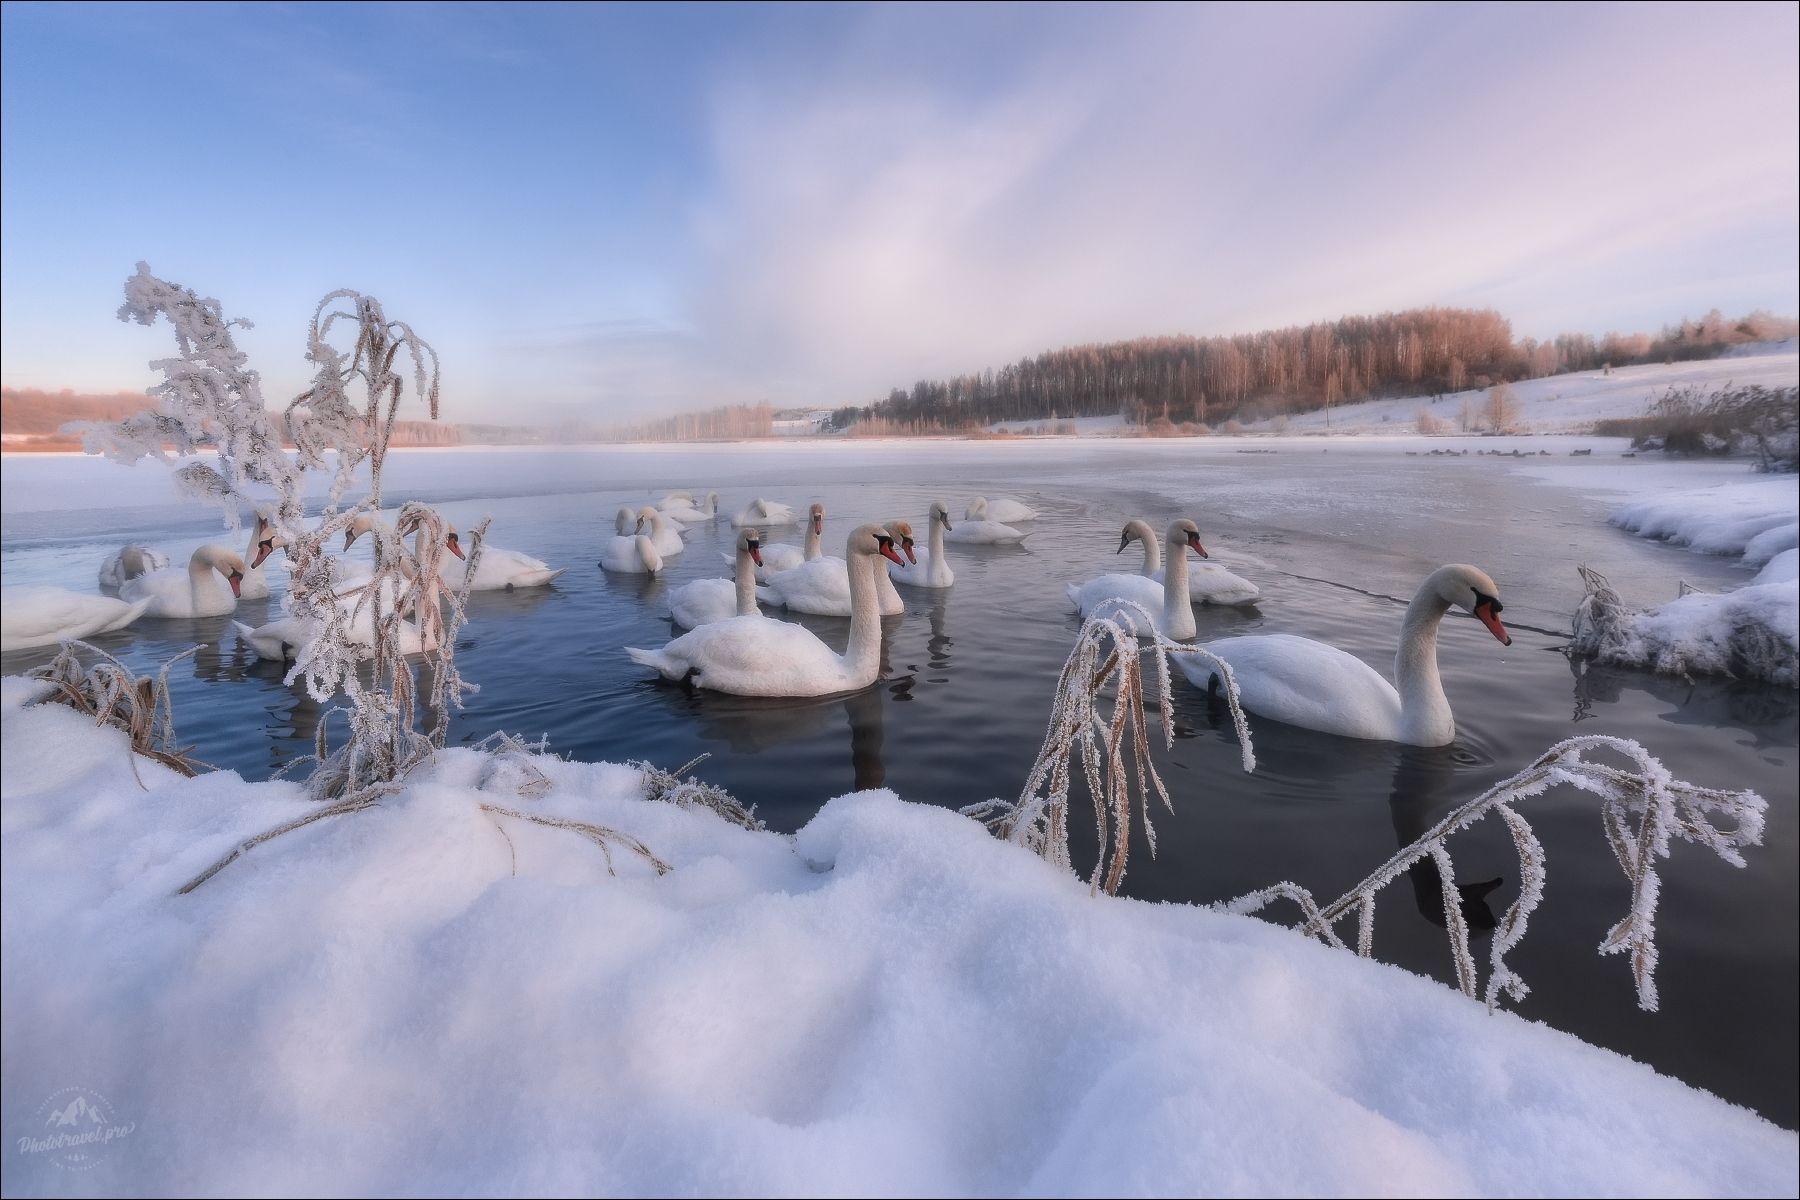 Утро на Лебедином озере .. Изборск Псков Изборско-Мальская долина лебеди лебединое озеро Городищенское Словенские ключи